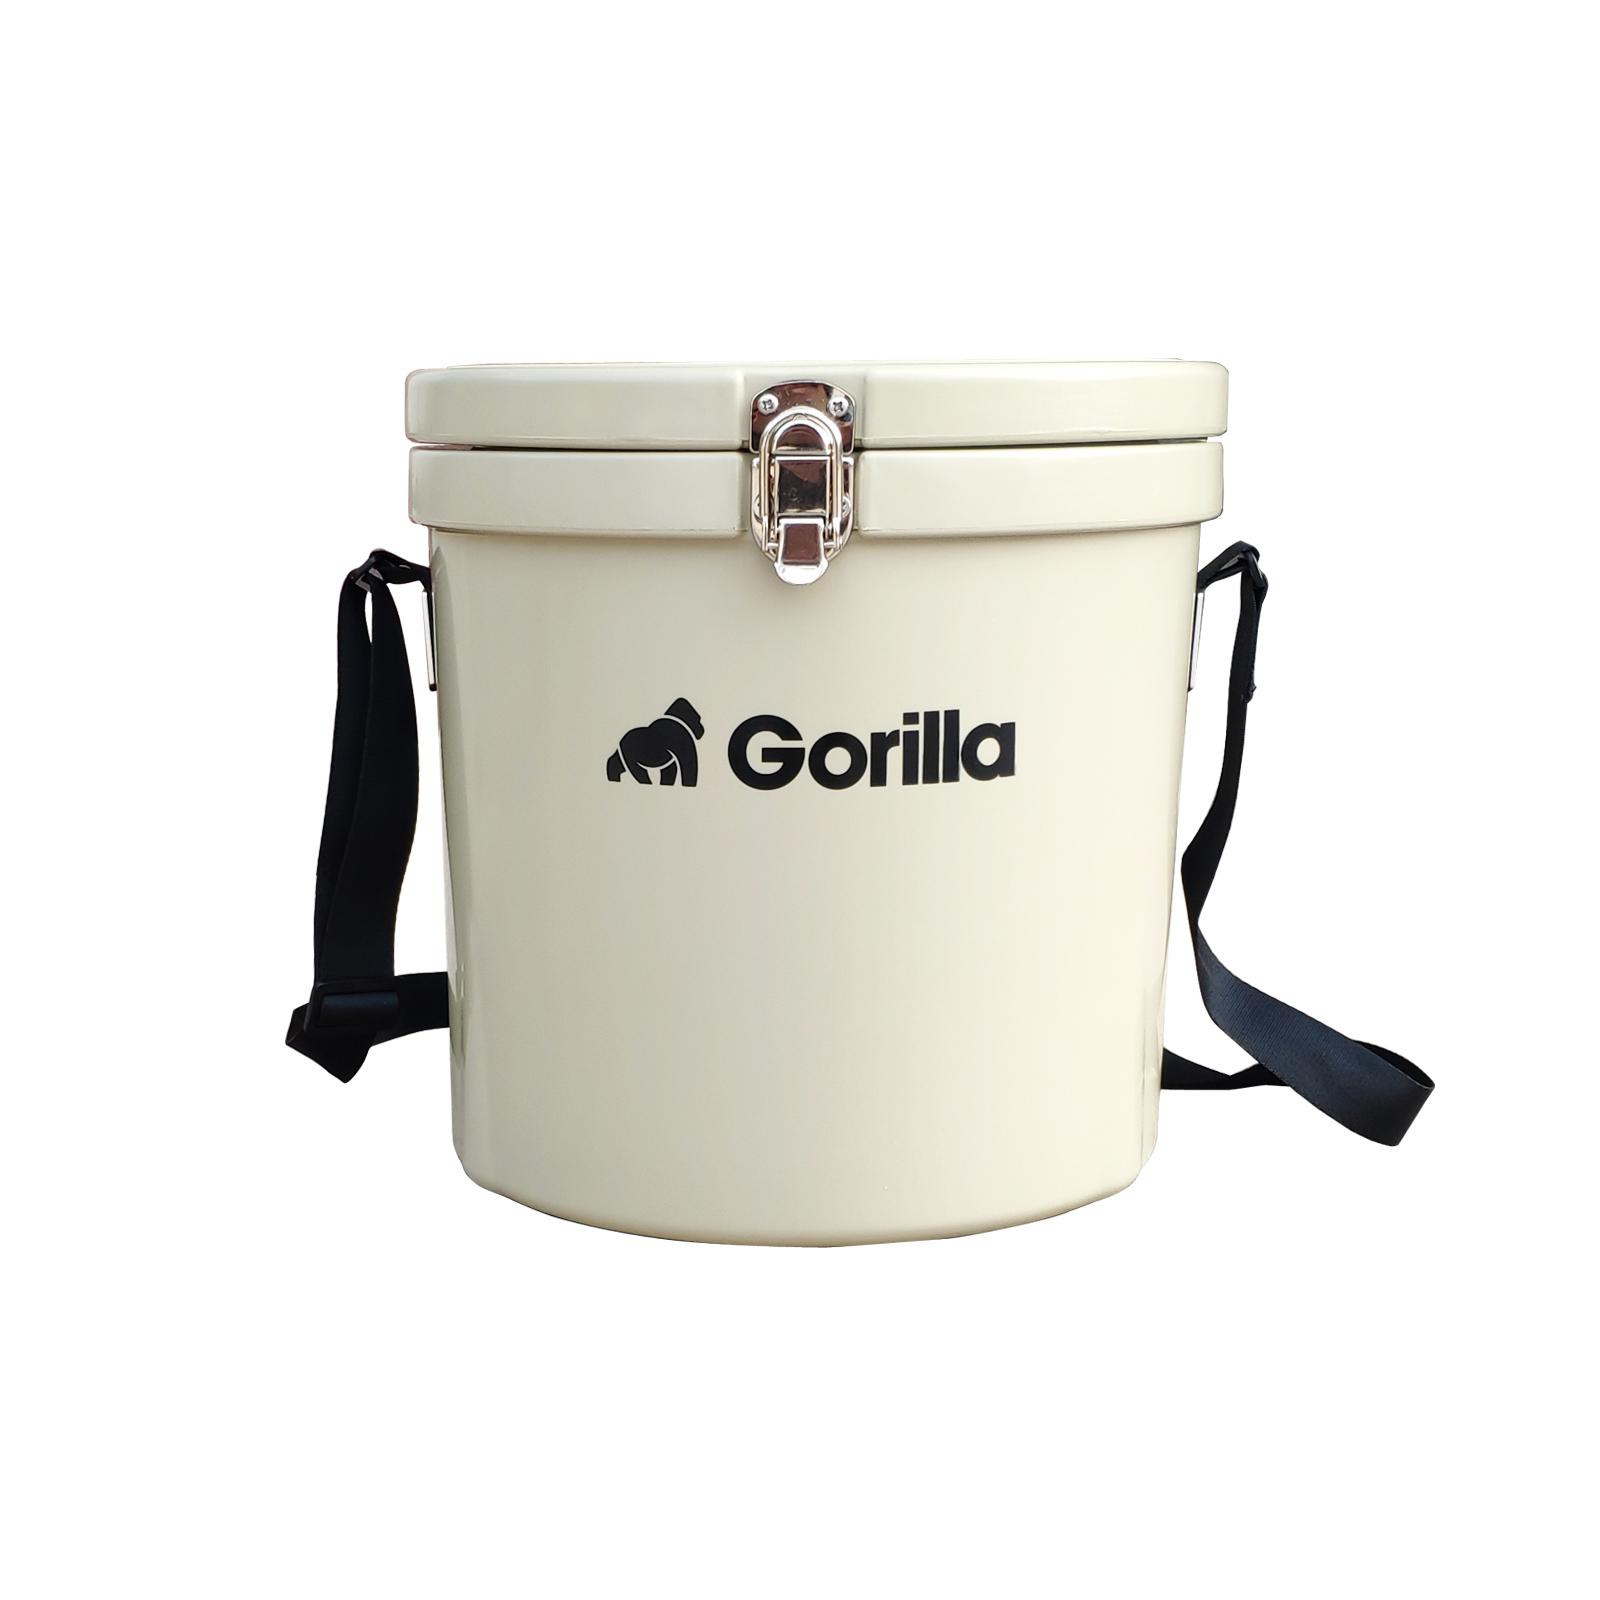 Gorilla: Bucket Ice Box Chilly Bin 12L image